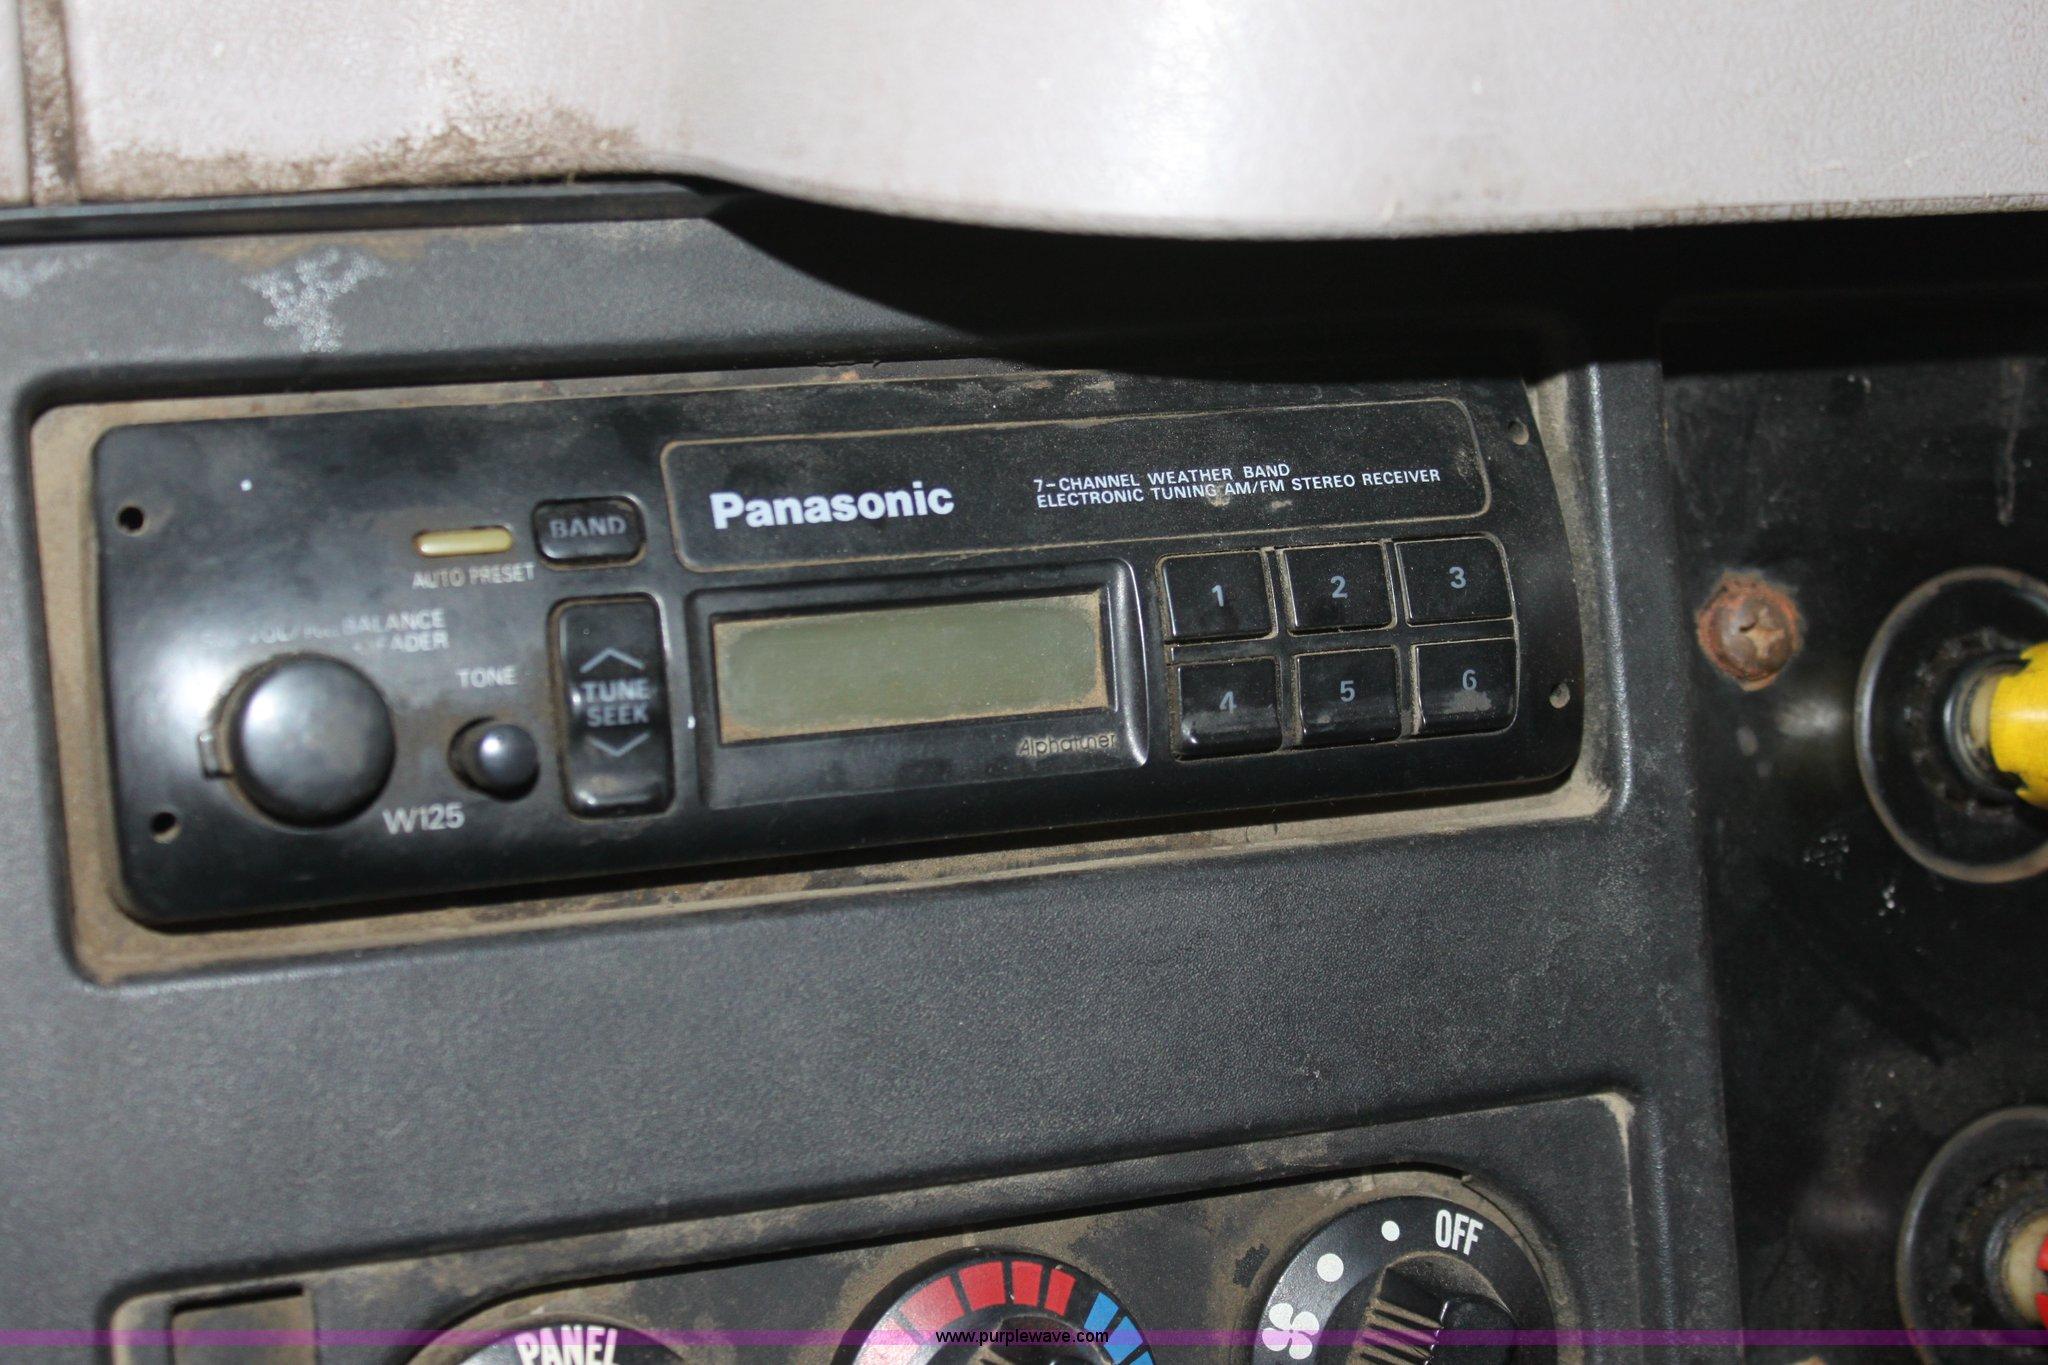 1997 International 4900 Tandem Axle Dump Truck Item A7172 Car Radio Wiring Panasonic W125 Full Size In New Window